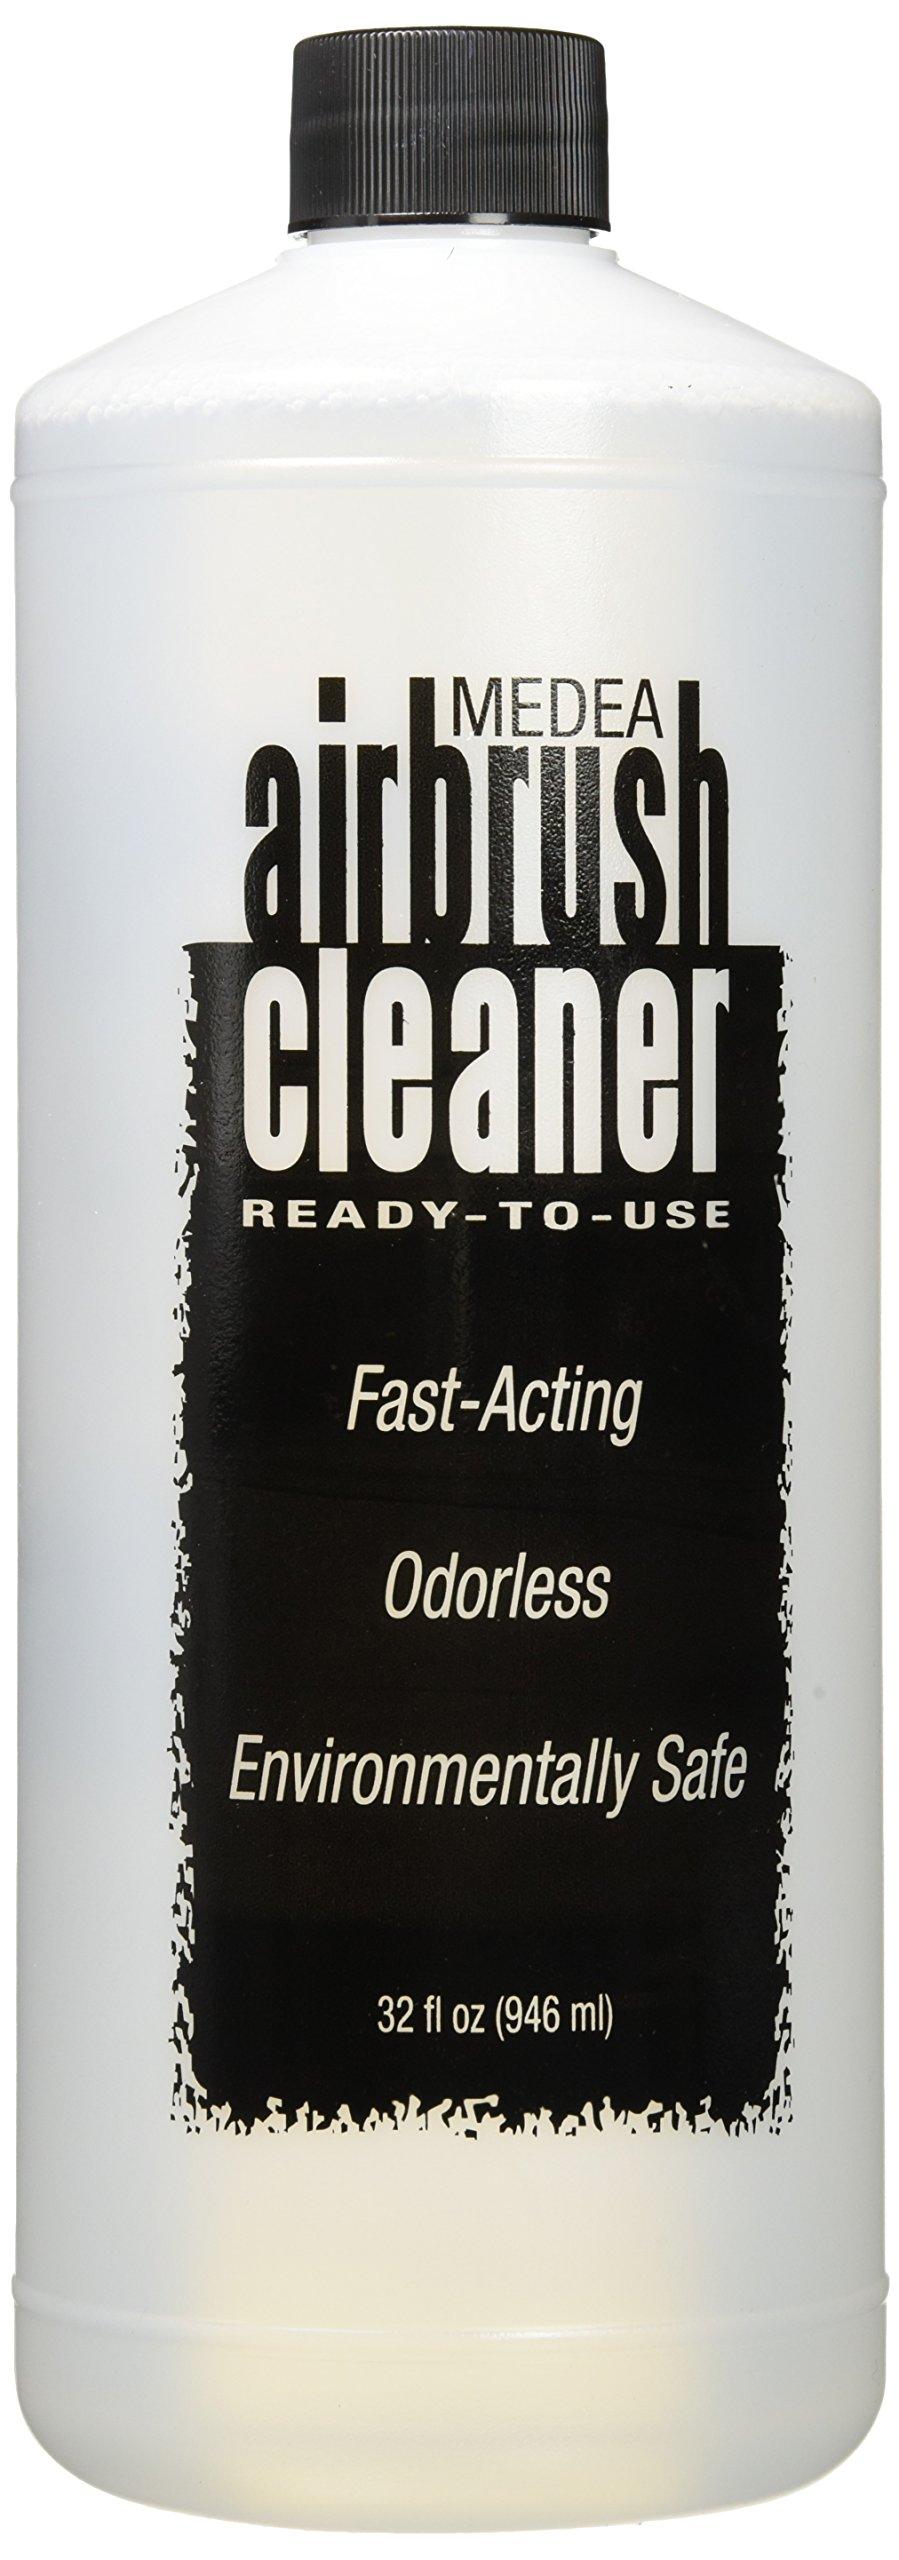 Iwata-Medea Airbrush Cleaner 32 oz by Iwata-Medea